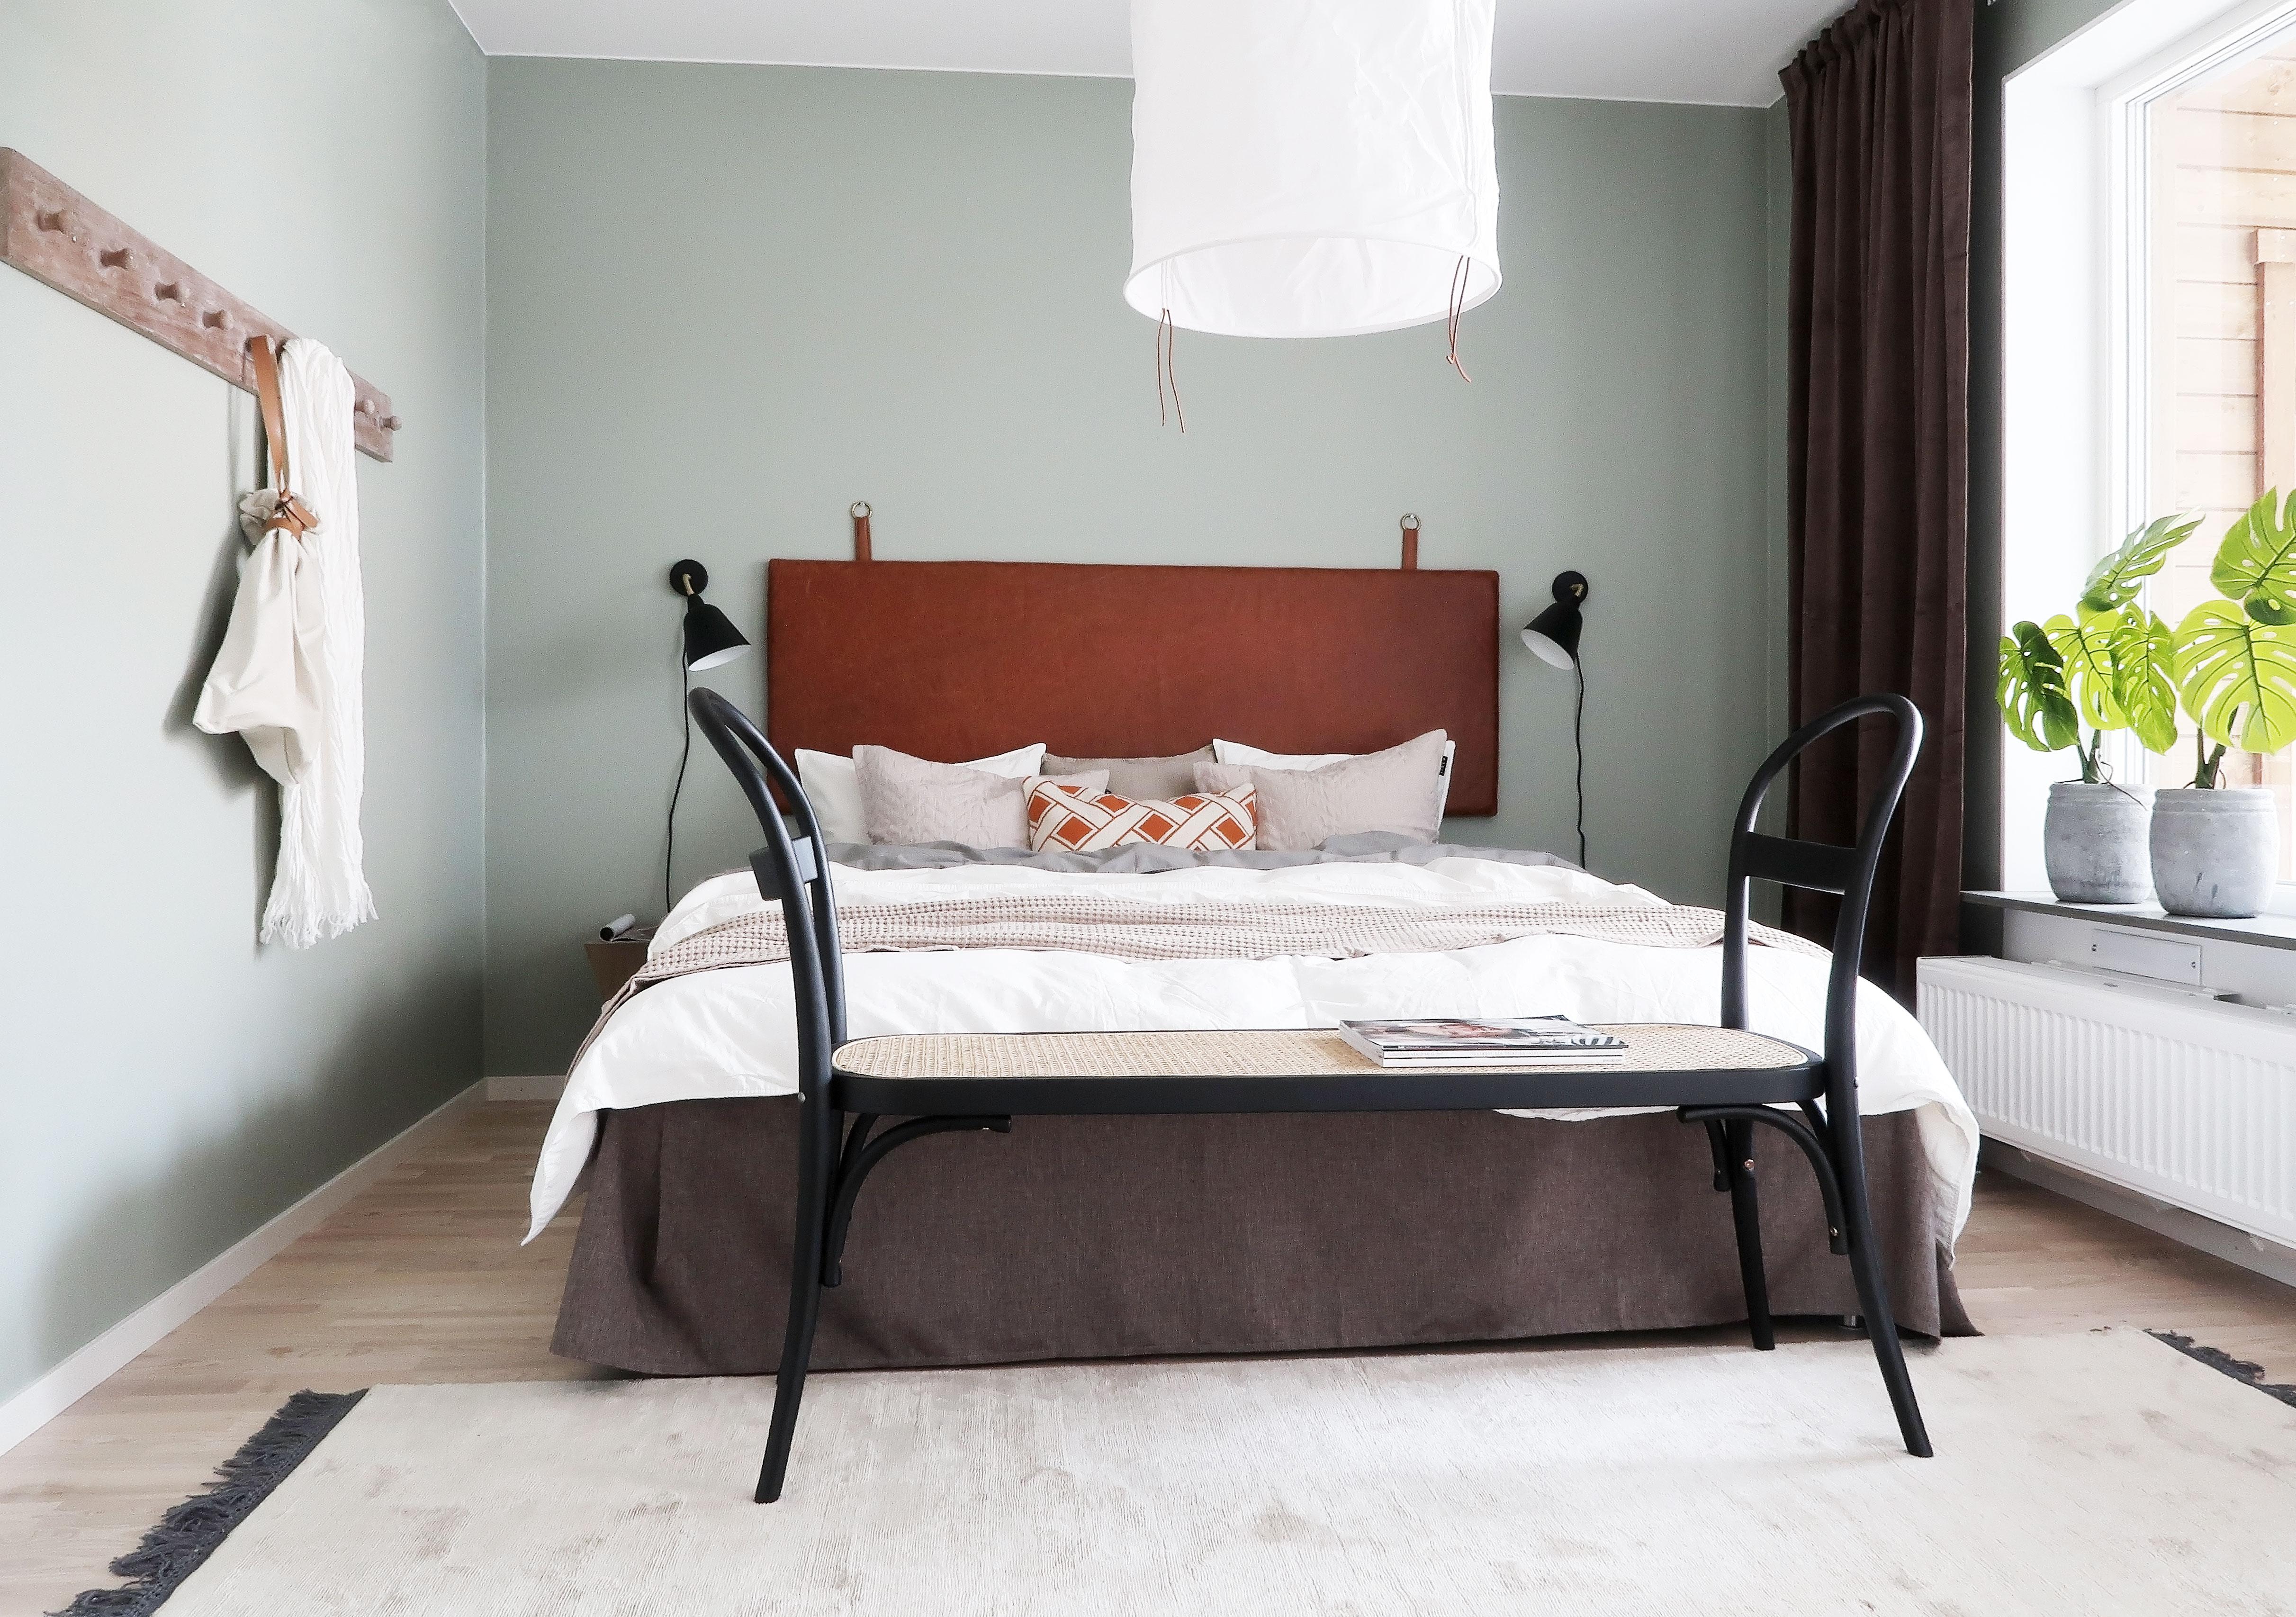 JM-slussen-sovrum-bedroom-interior-2